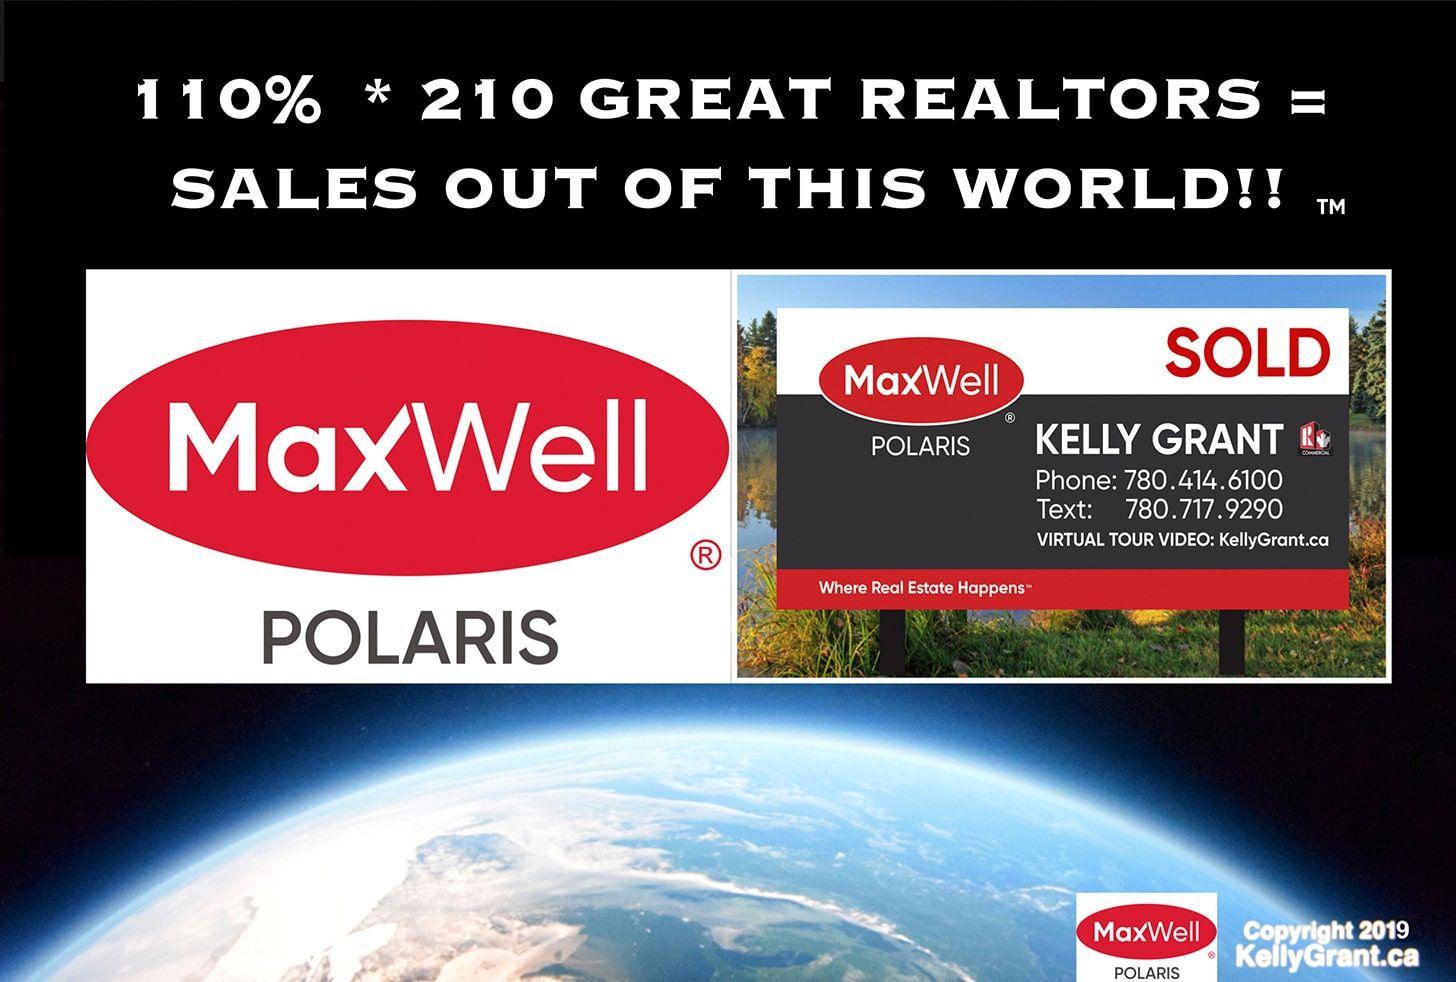 #2-KG MaxWell 110*210.jpg